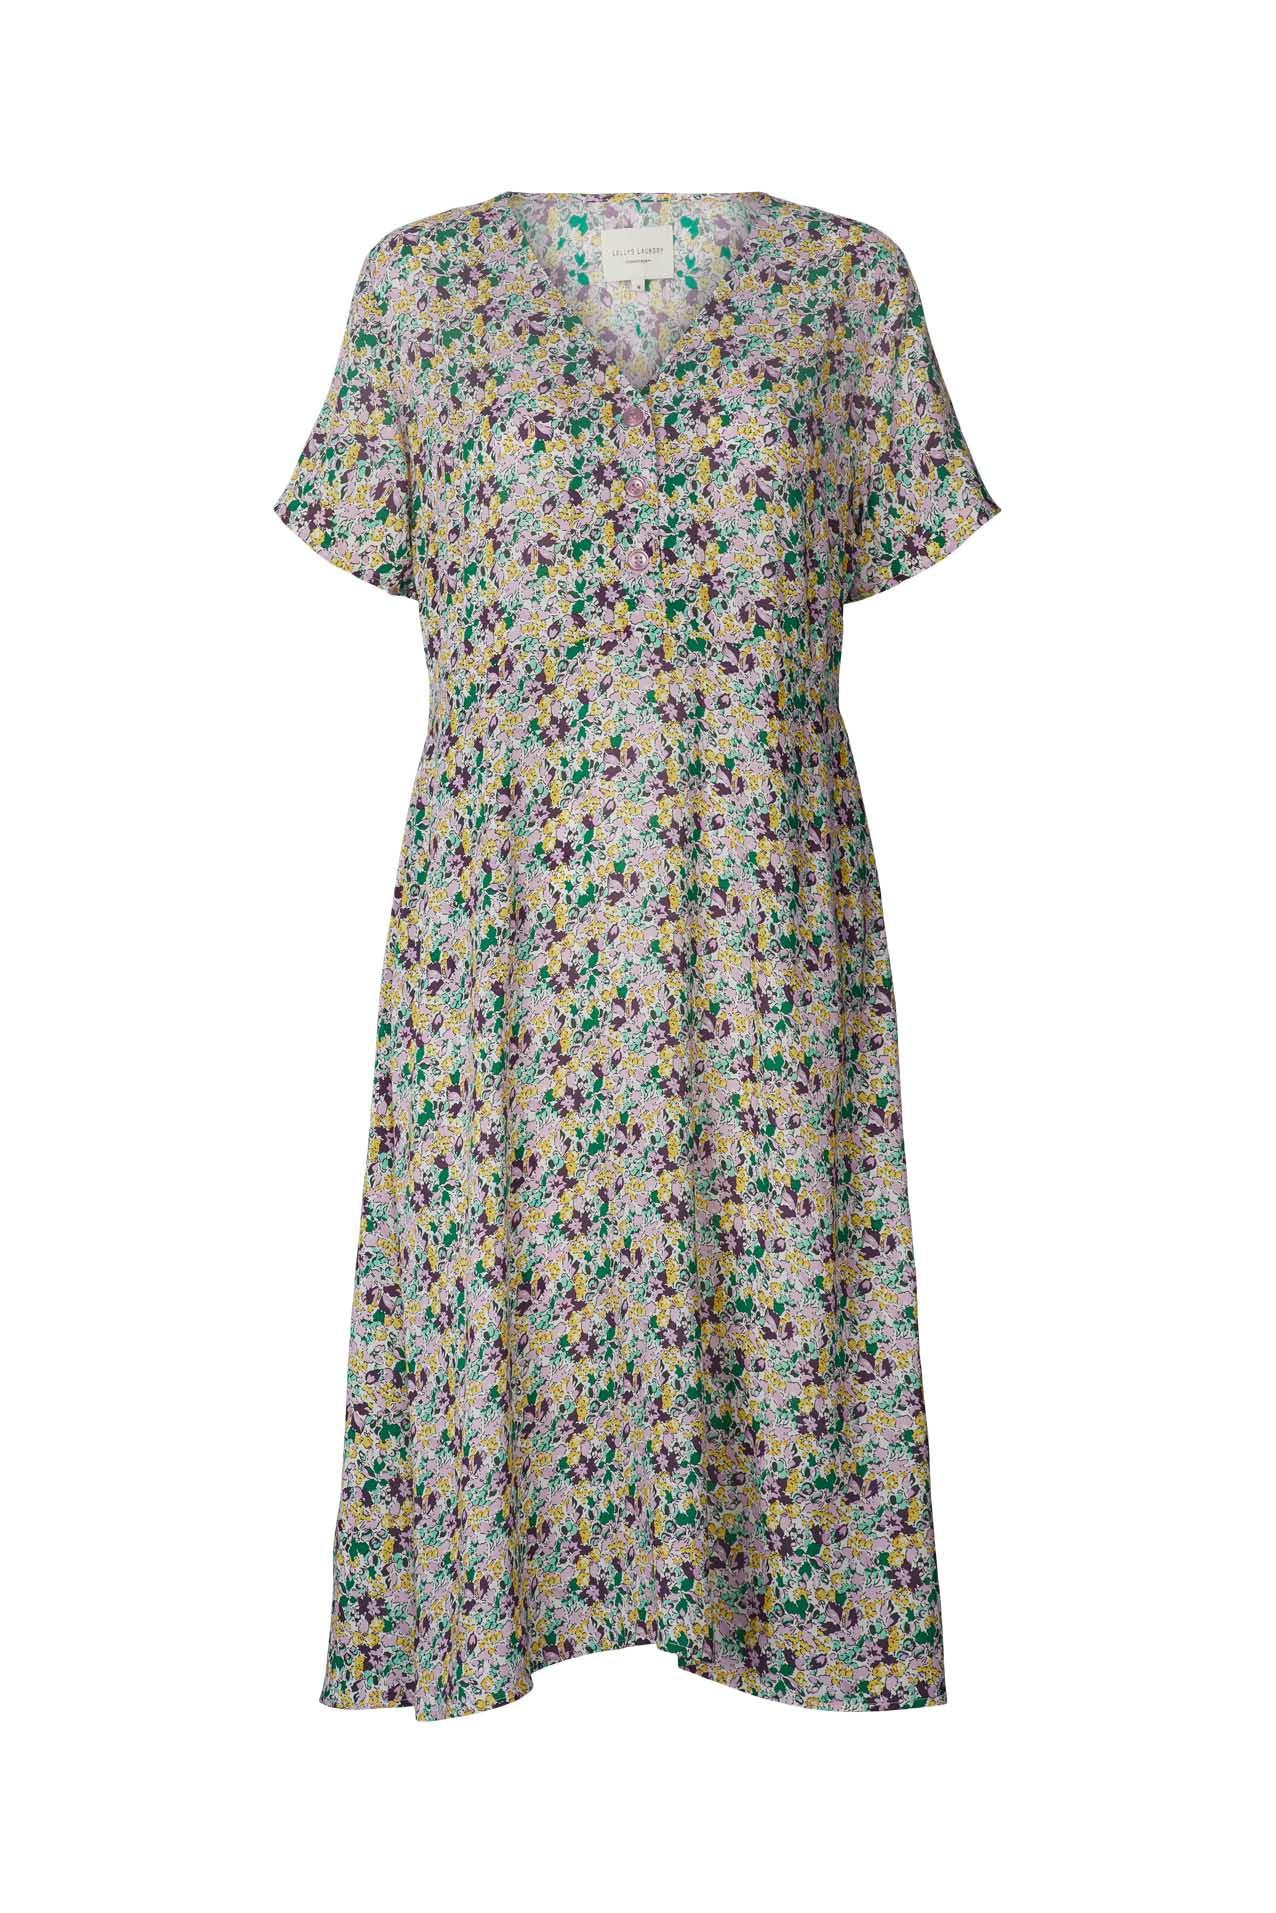 Lollys Laundry Anja kjole